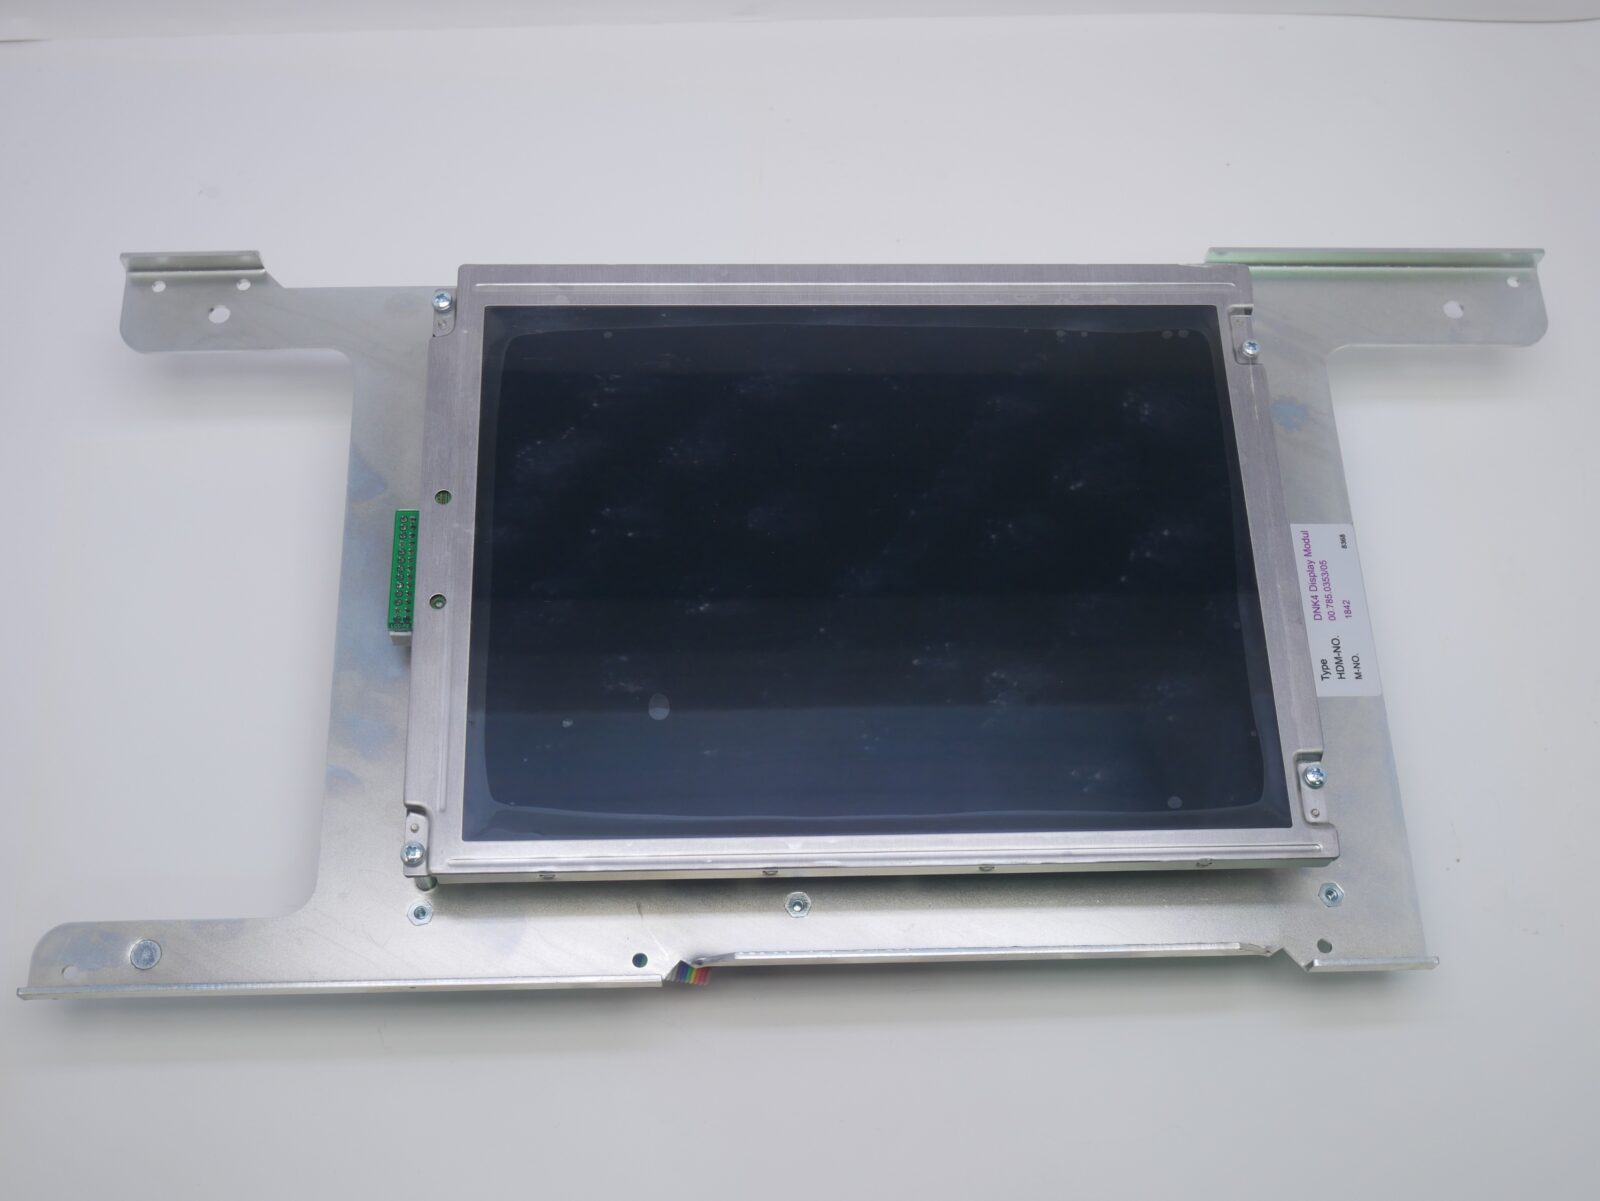 Screen DNK4 Display Module  (TFT) HDM: 00.785.0353/05 or MV.036.387/03